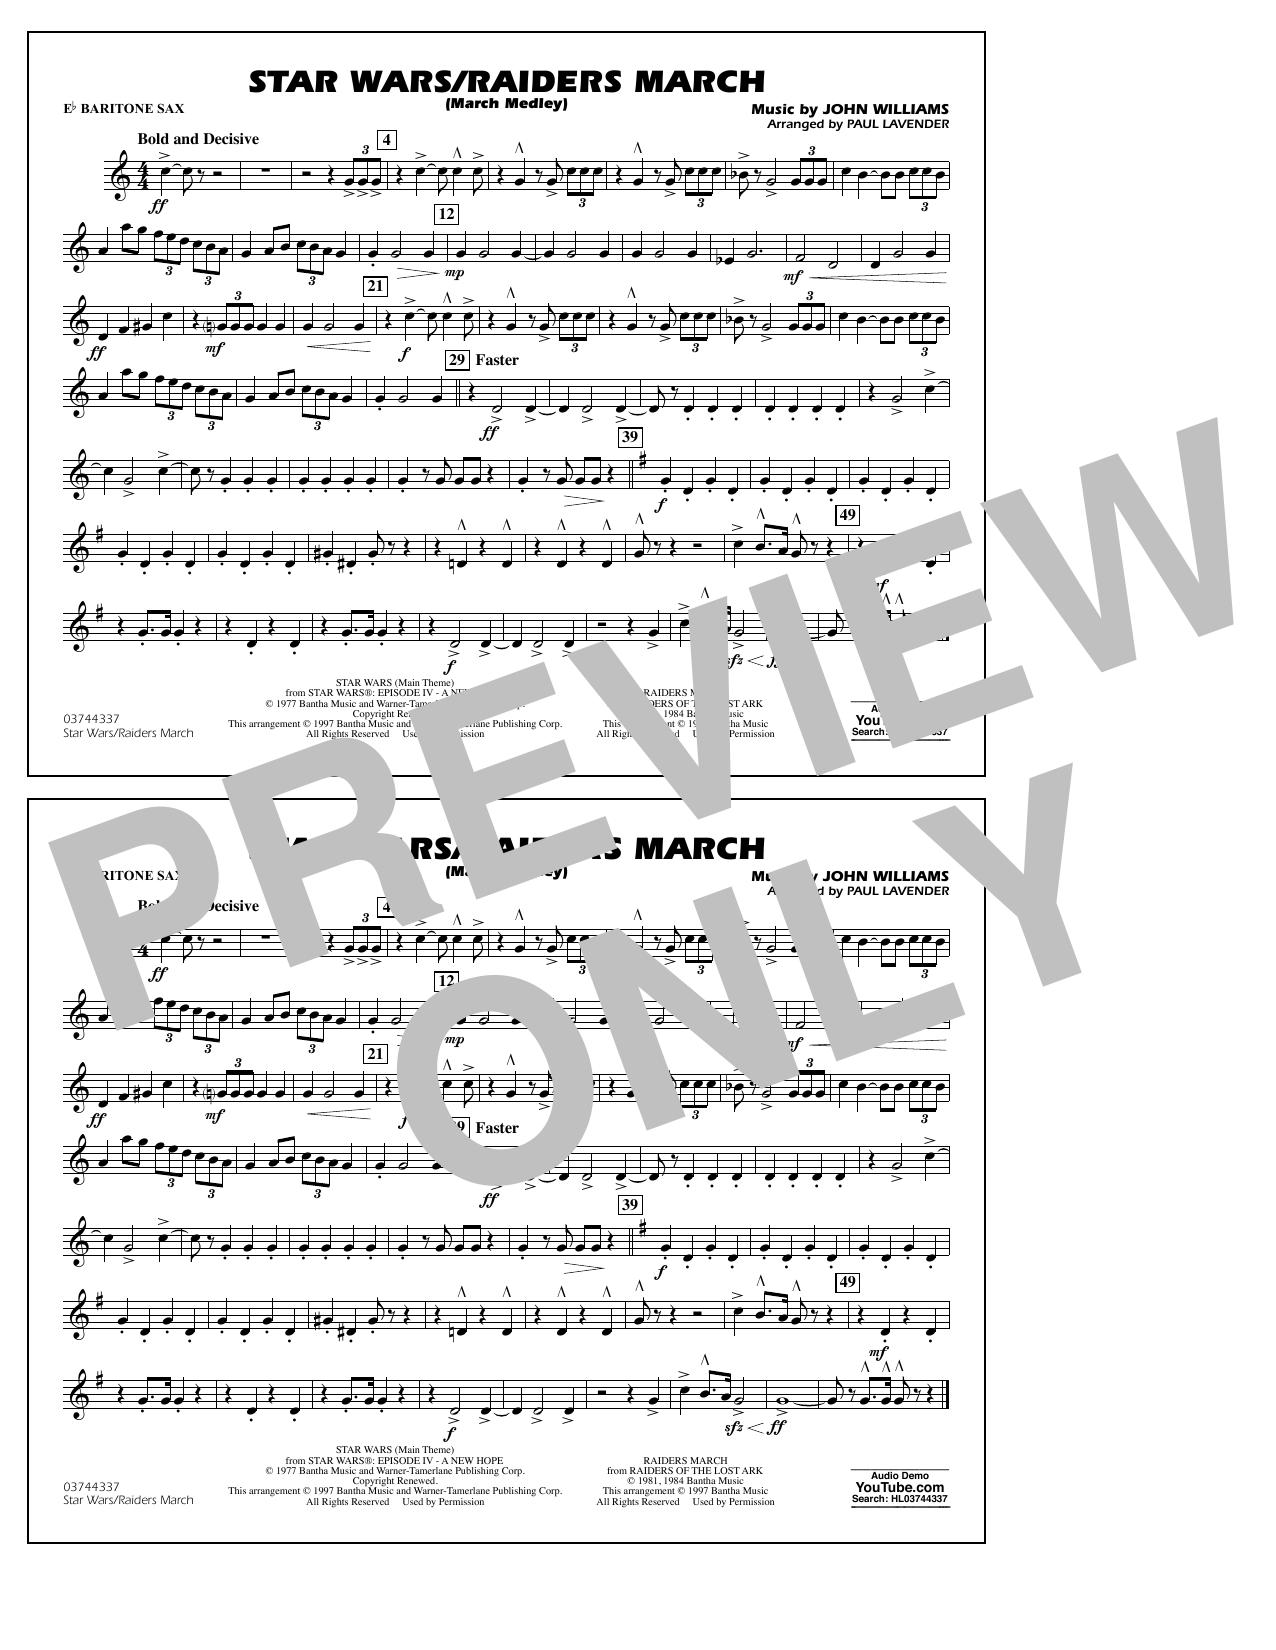 Star Wars/Raiders March - Eb Baritone Sax Sheet Music